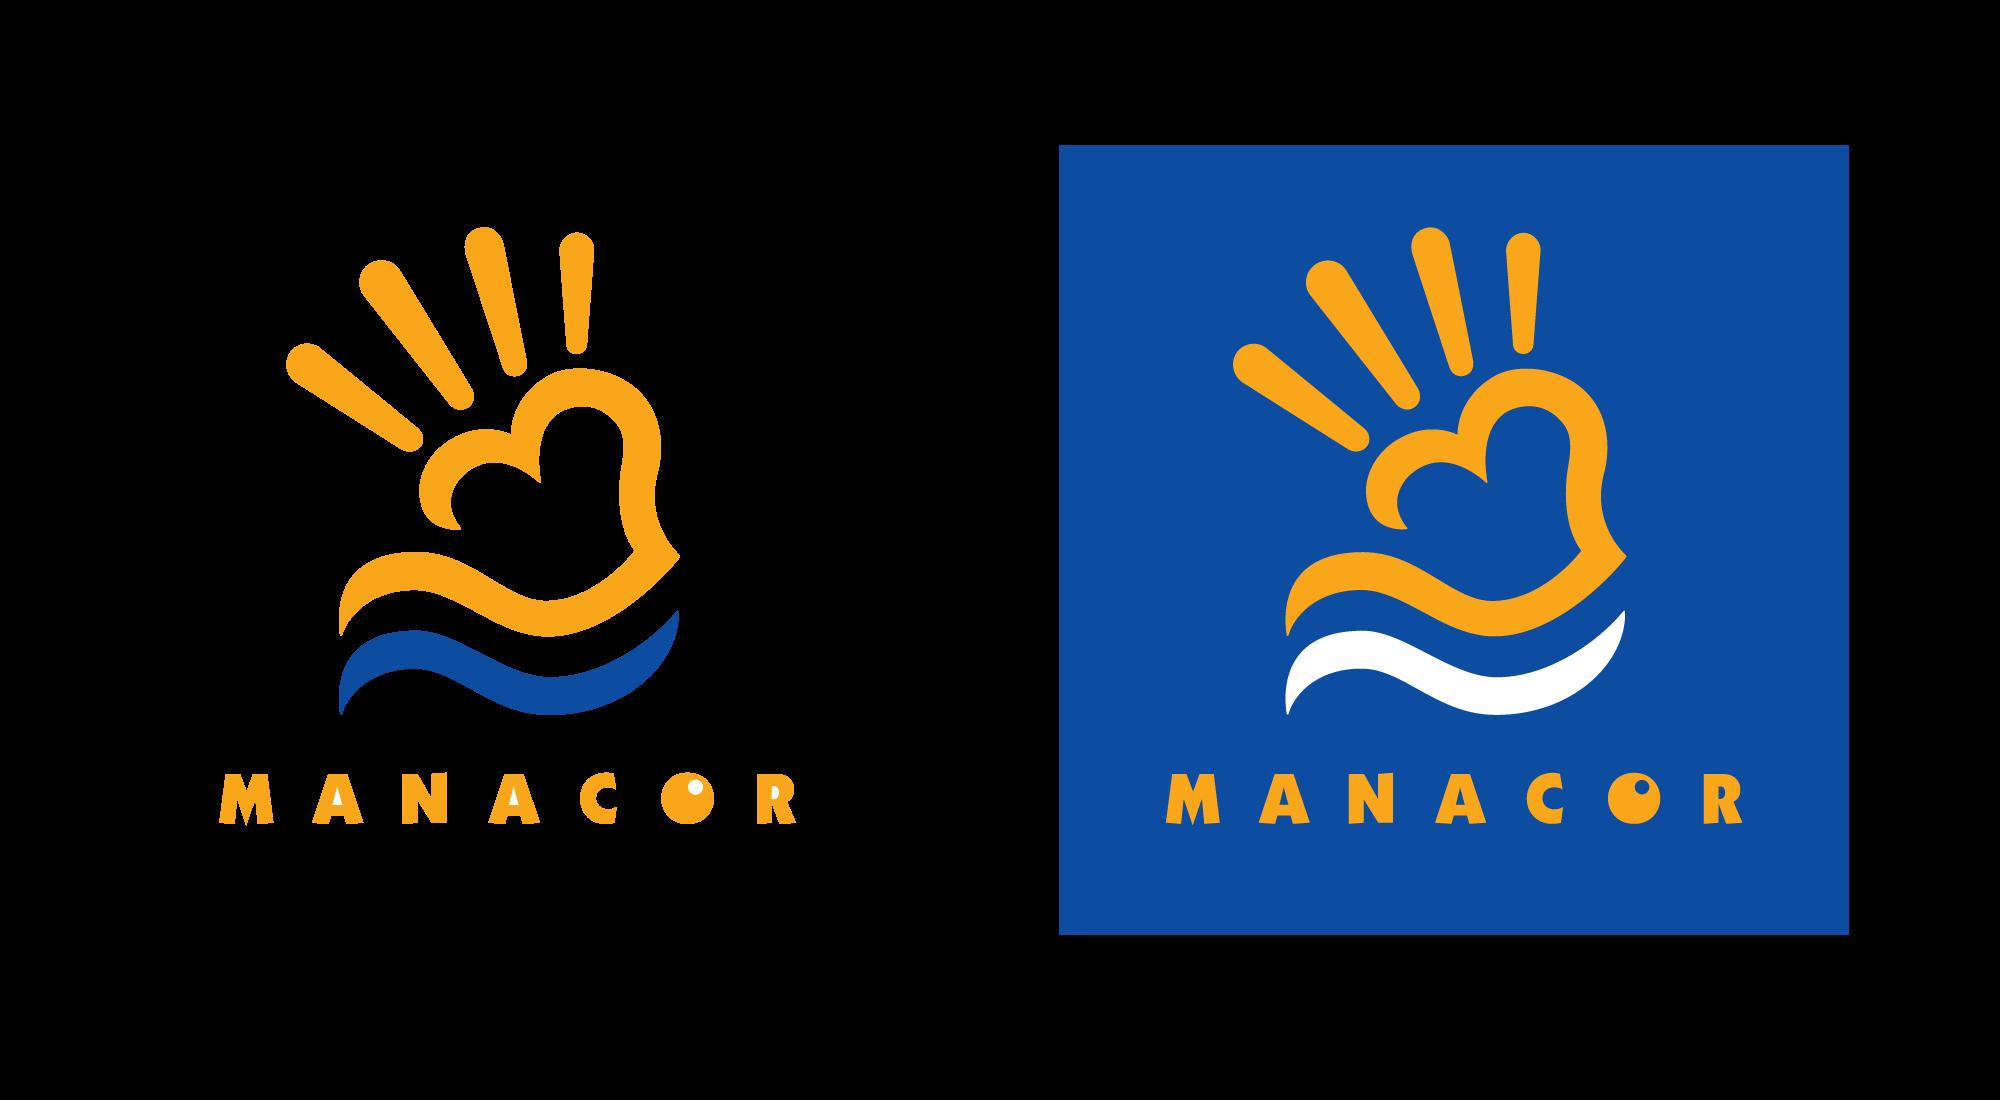 manacor-logos